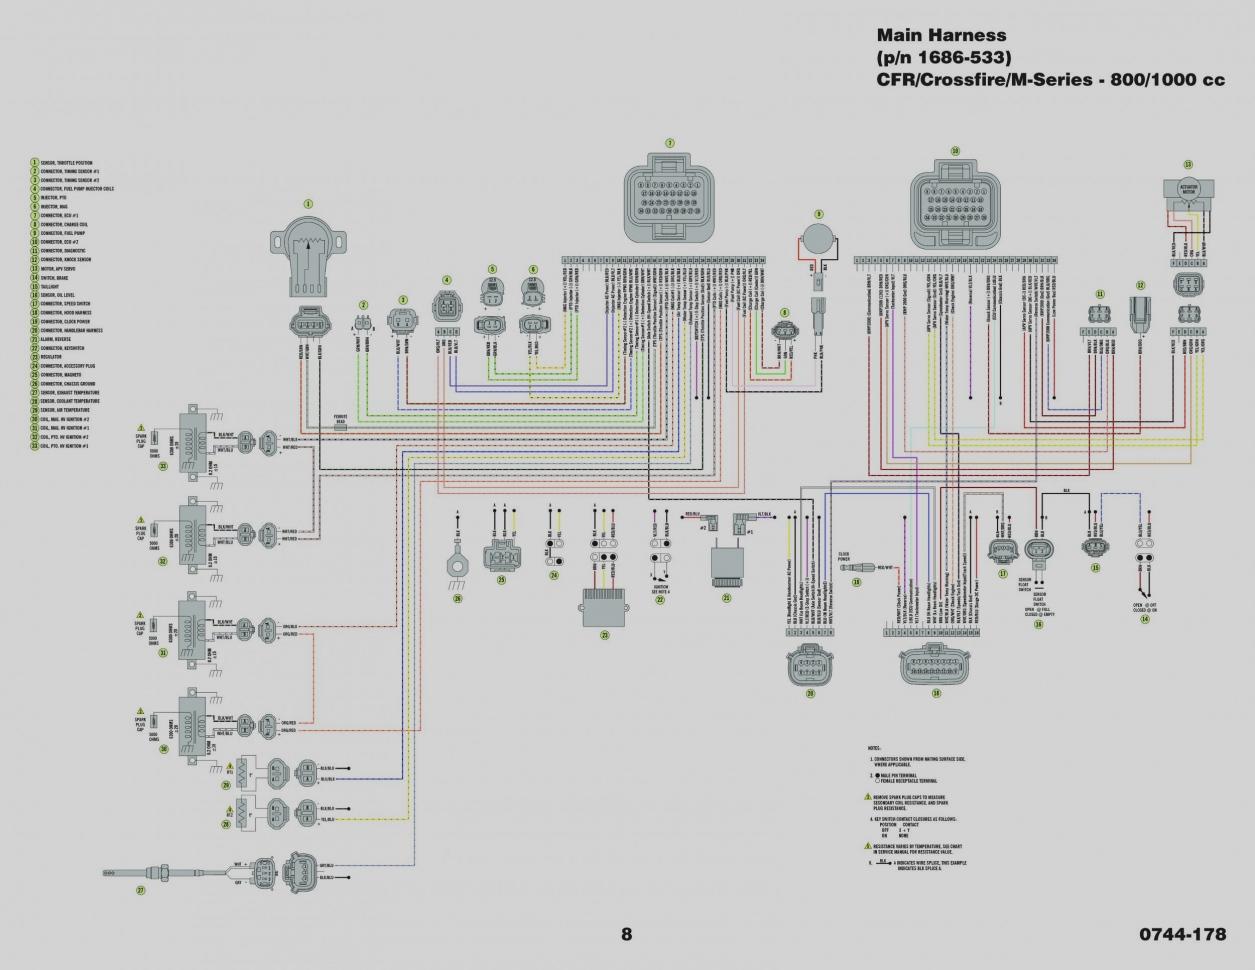 hight resolution of 2011 polaris rzr 800 wiring diagram elegant 2010 polaris ranger 800 xp wiring diagram 2016